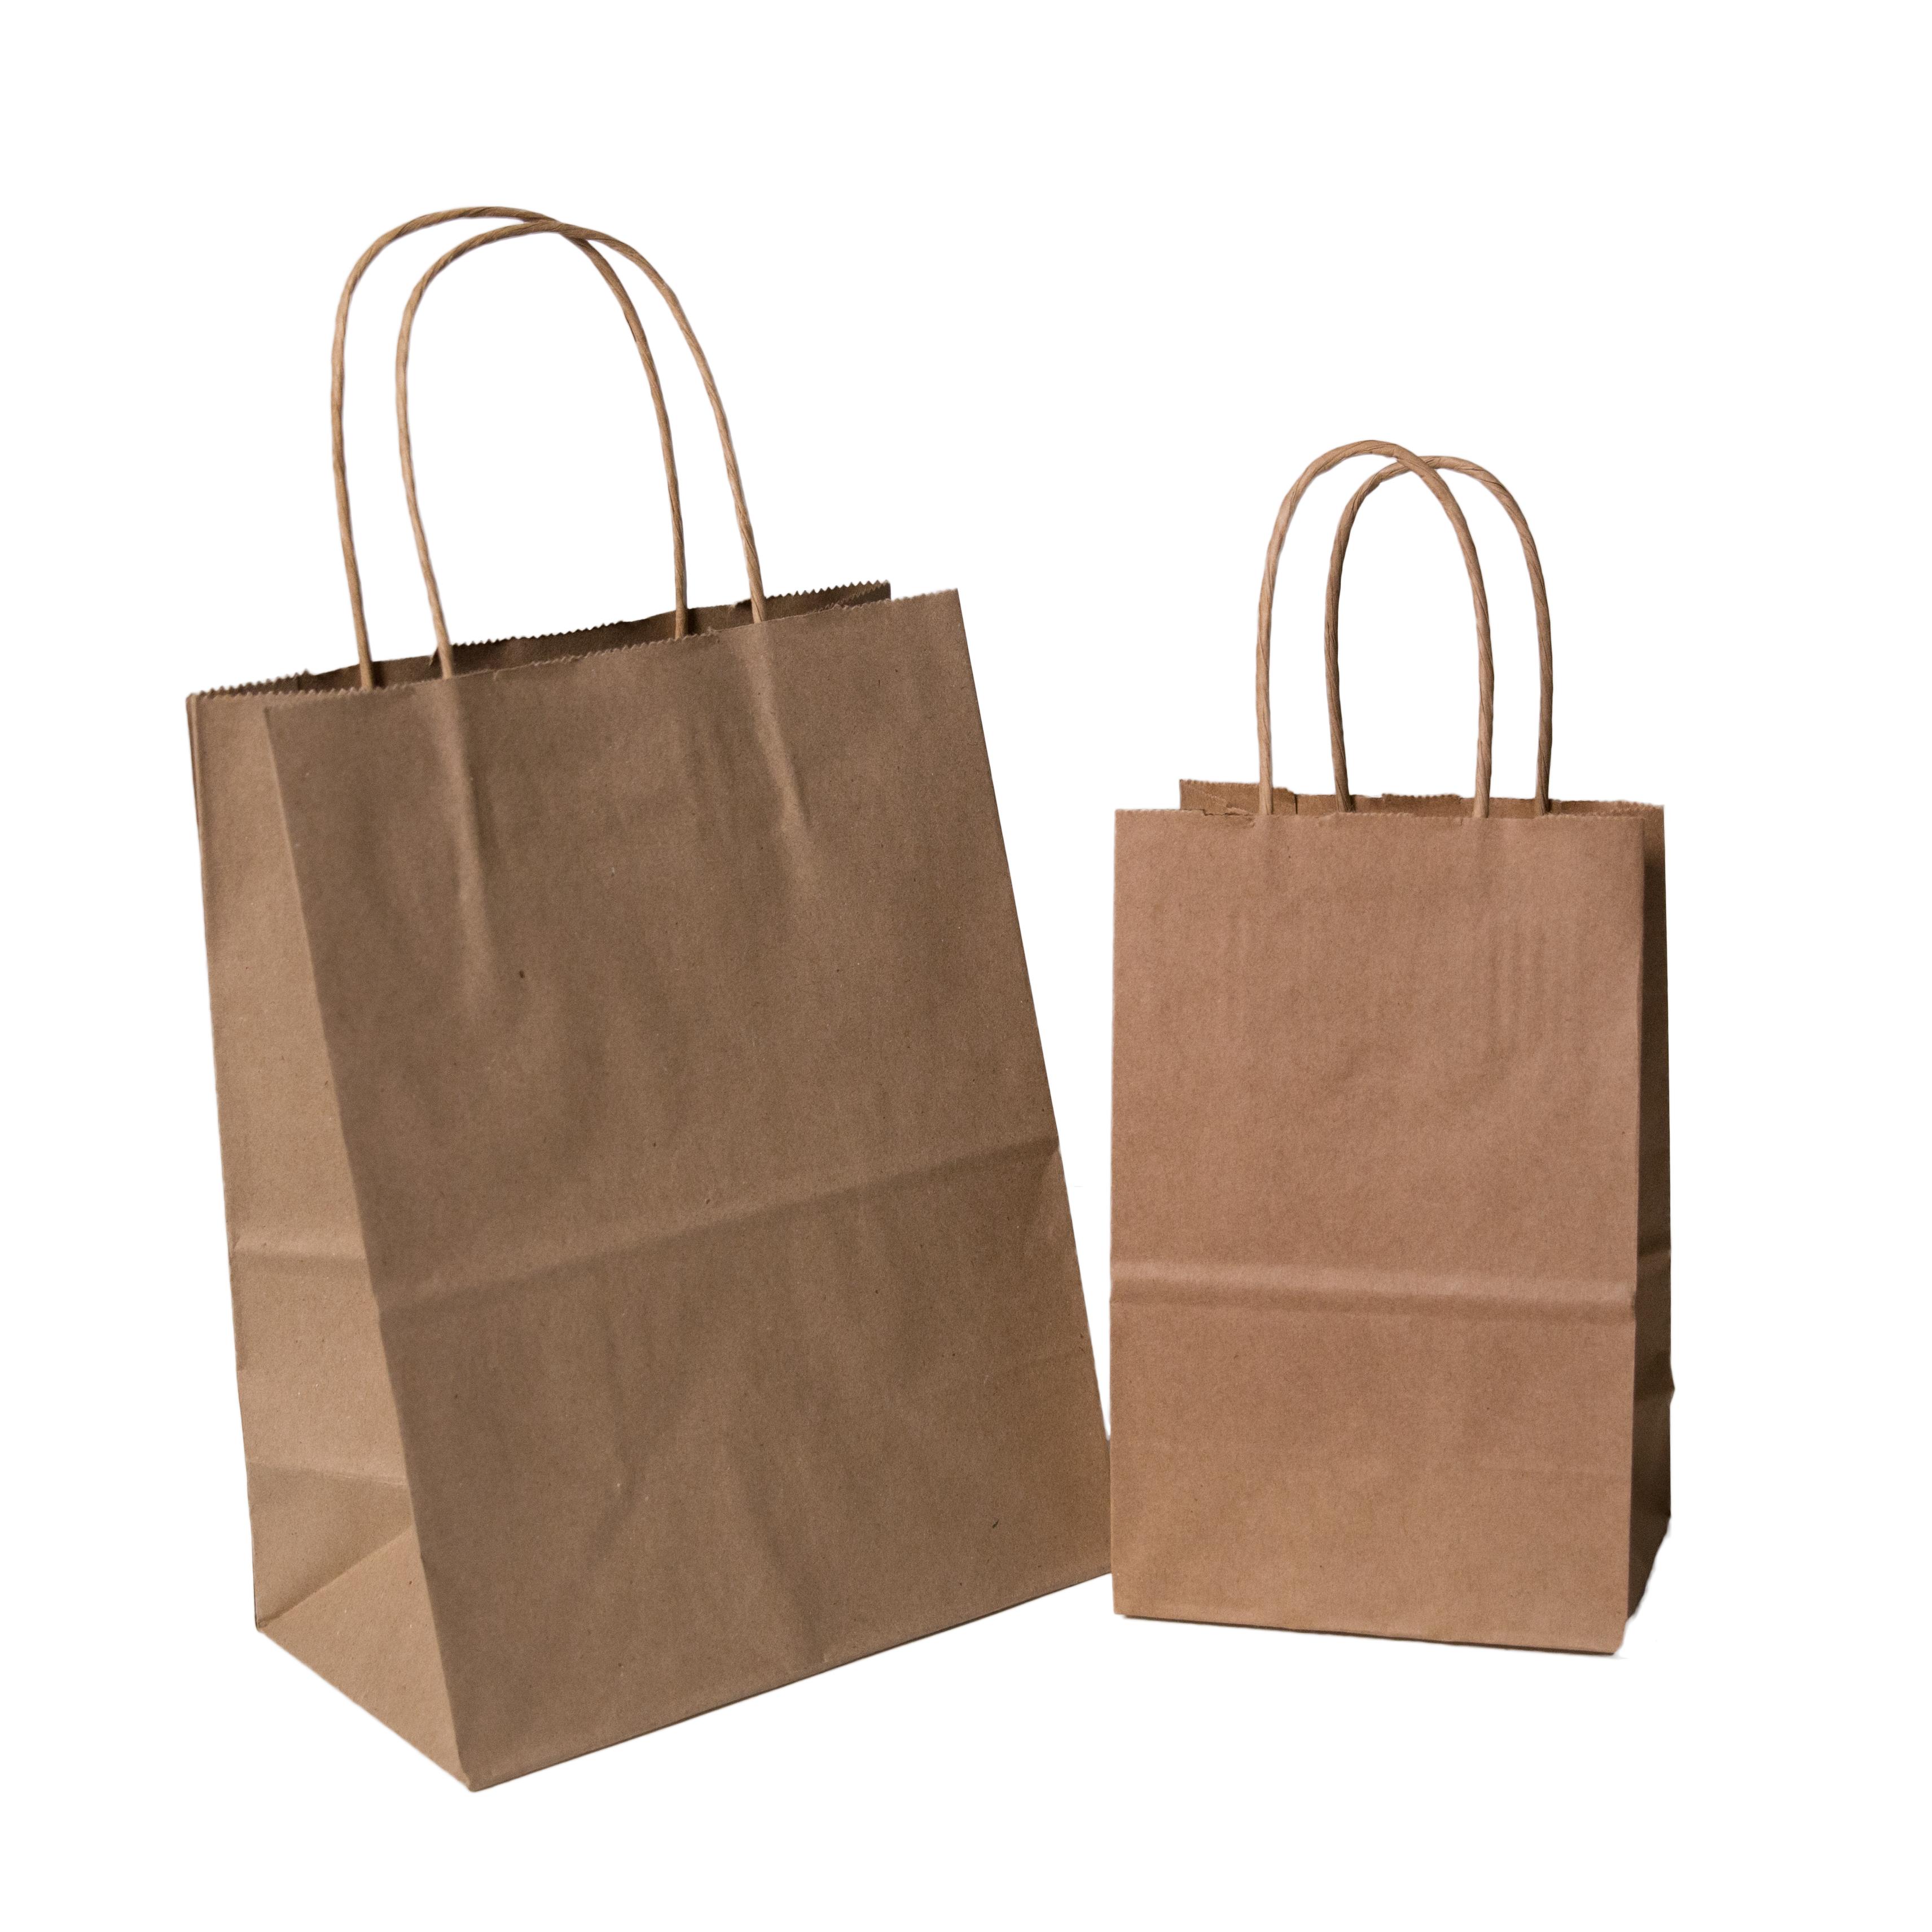 Shopping bags photo